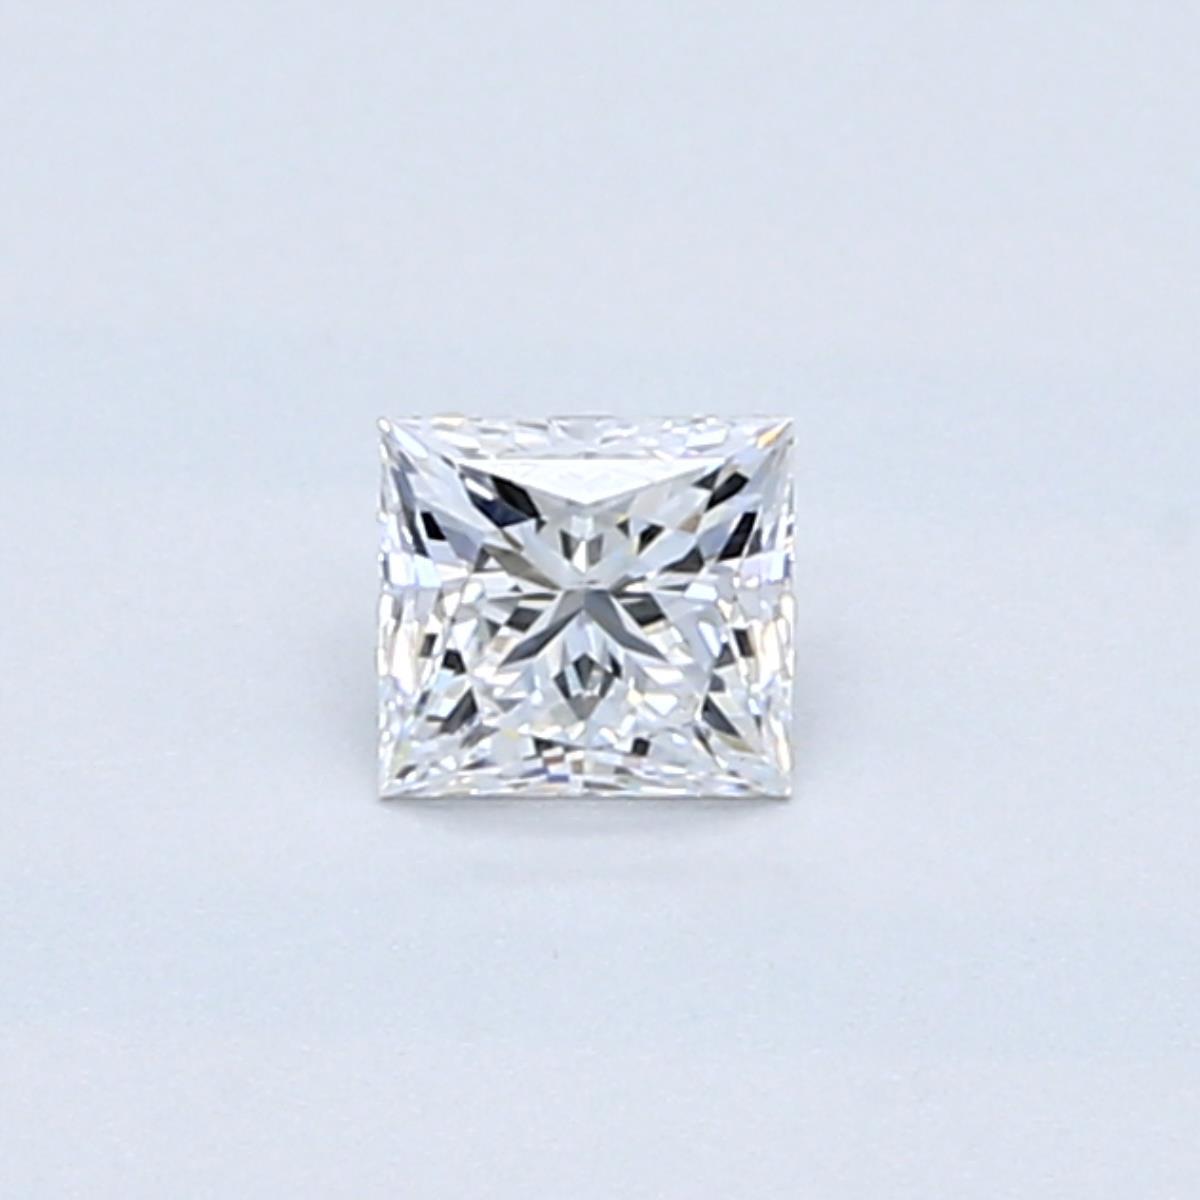 0.32 PR Diamond (D, SI1)